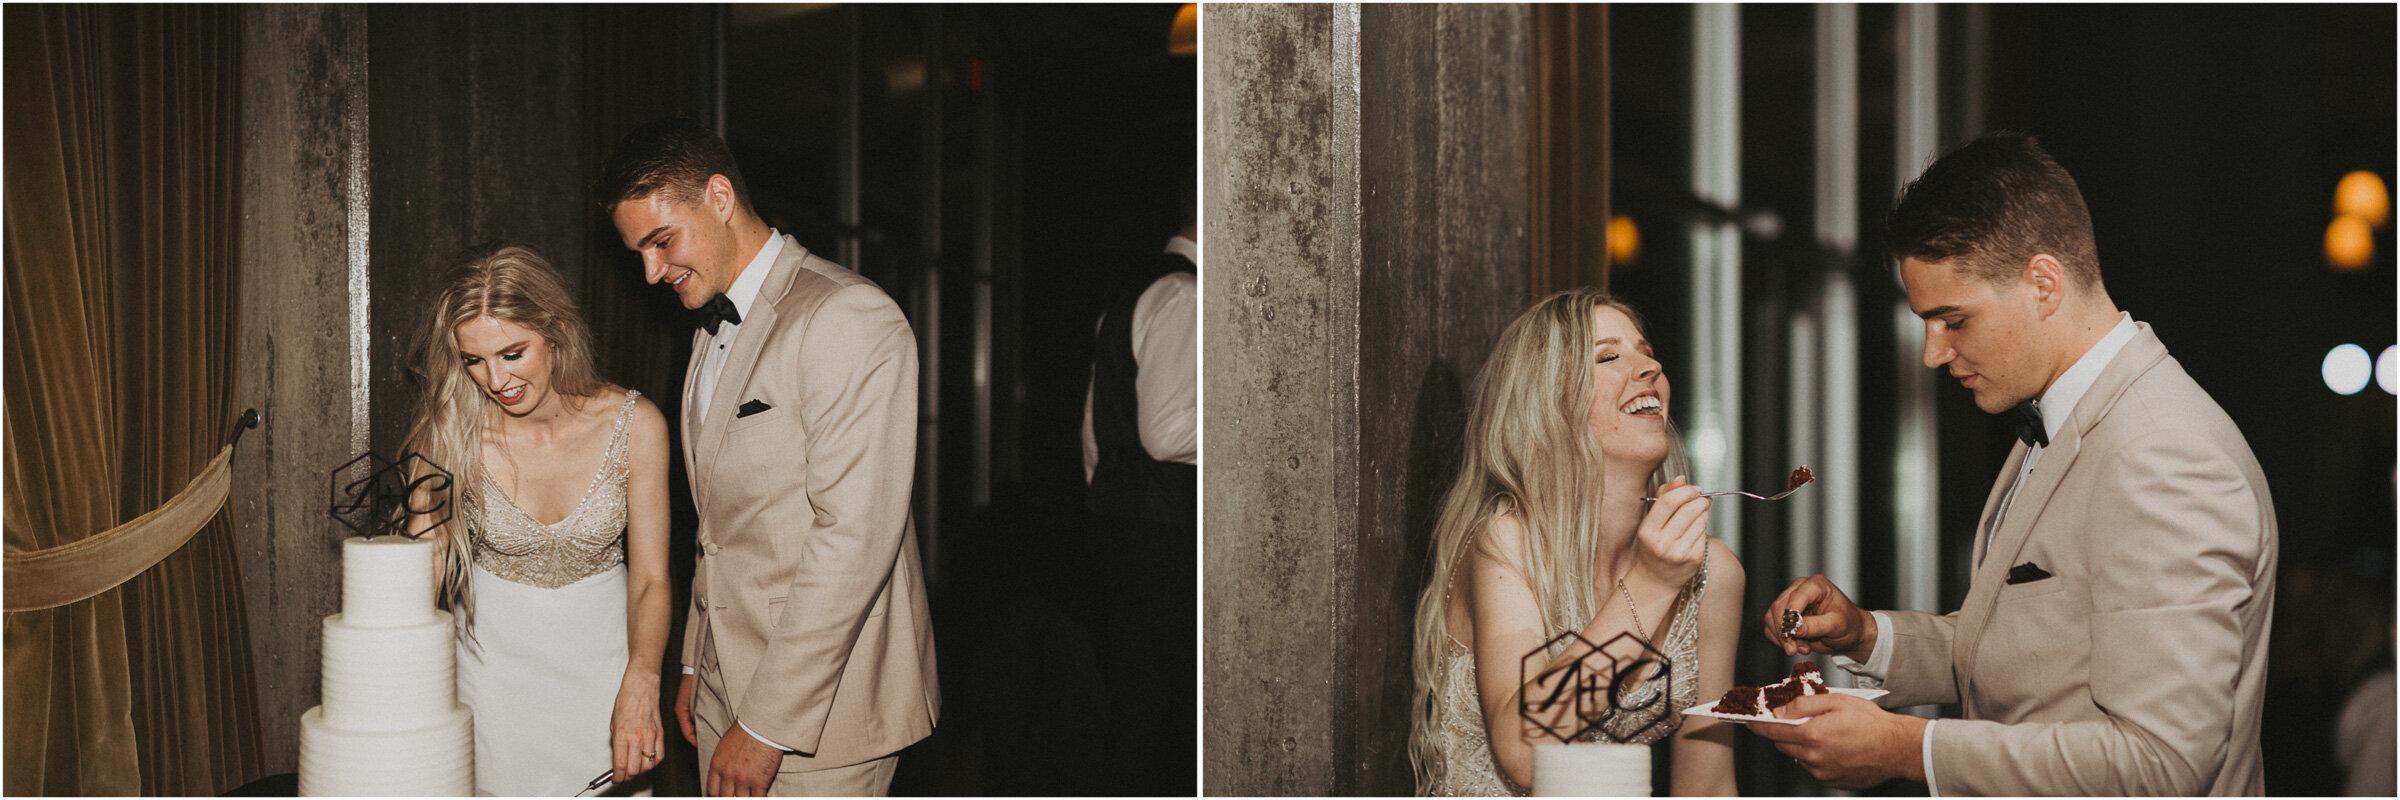 alyssa barletter photography downtown kansas city wedding boulevard brewery reception rainy day wedding-59.jpg